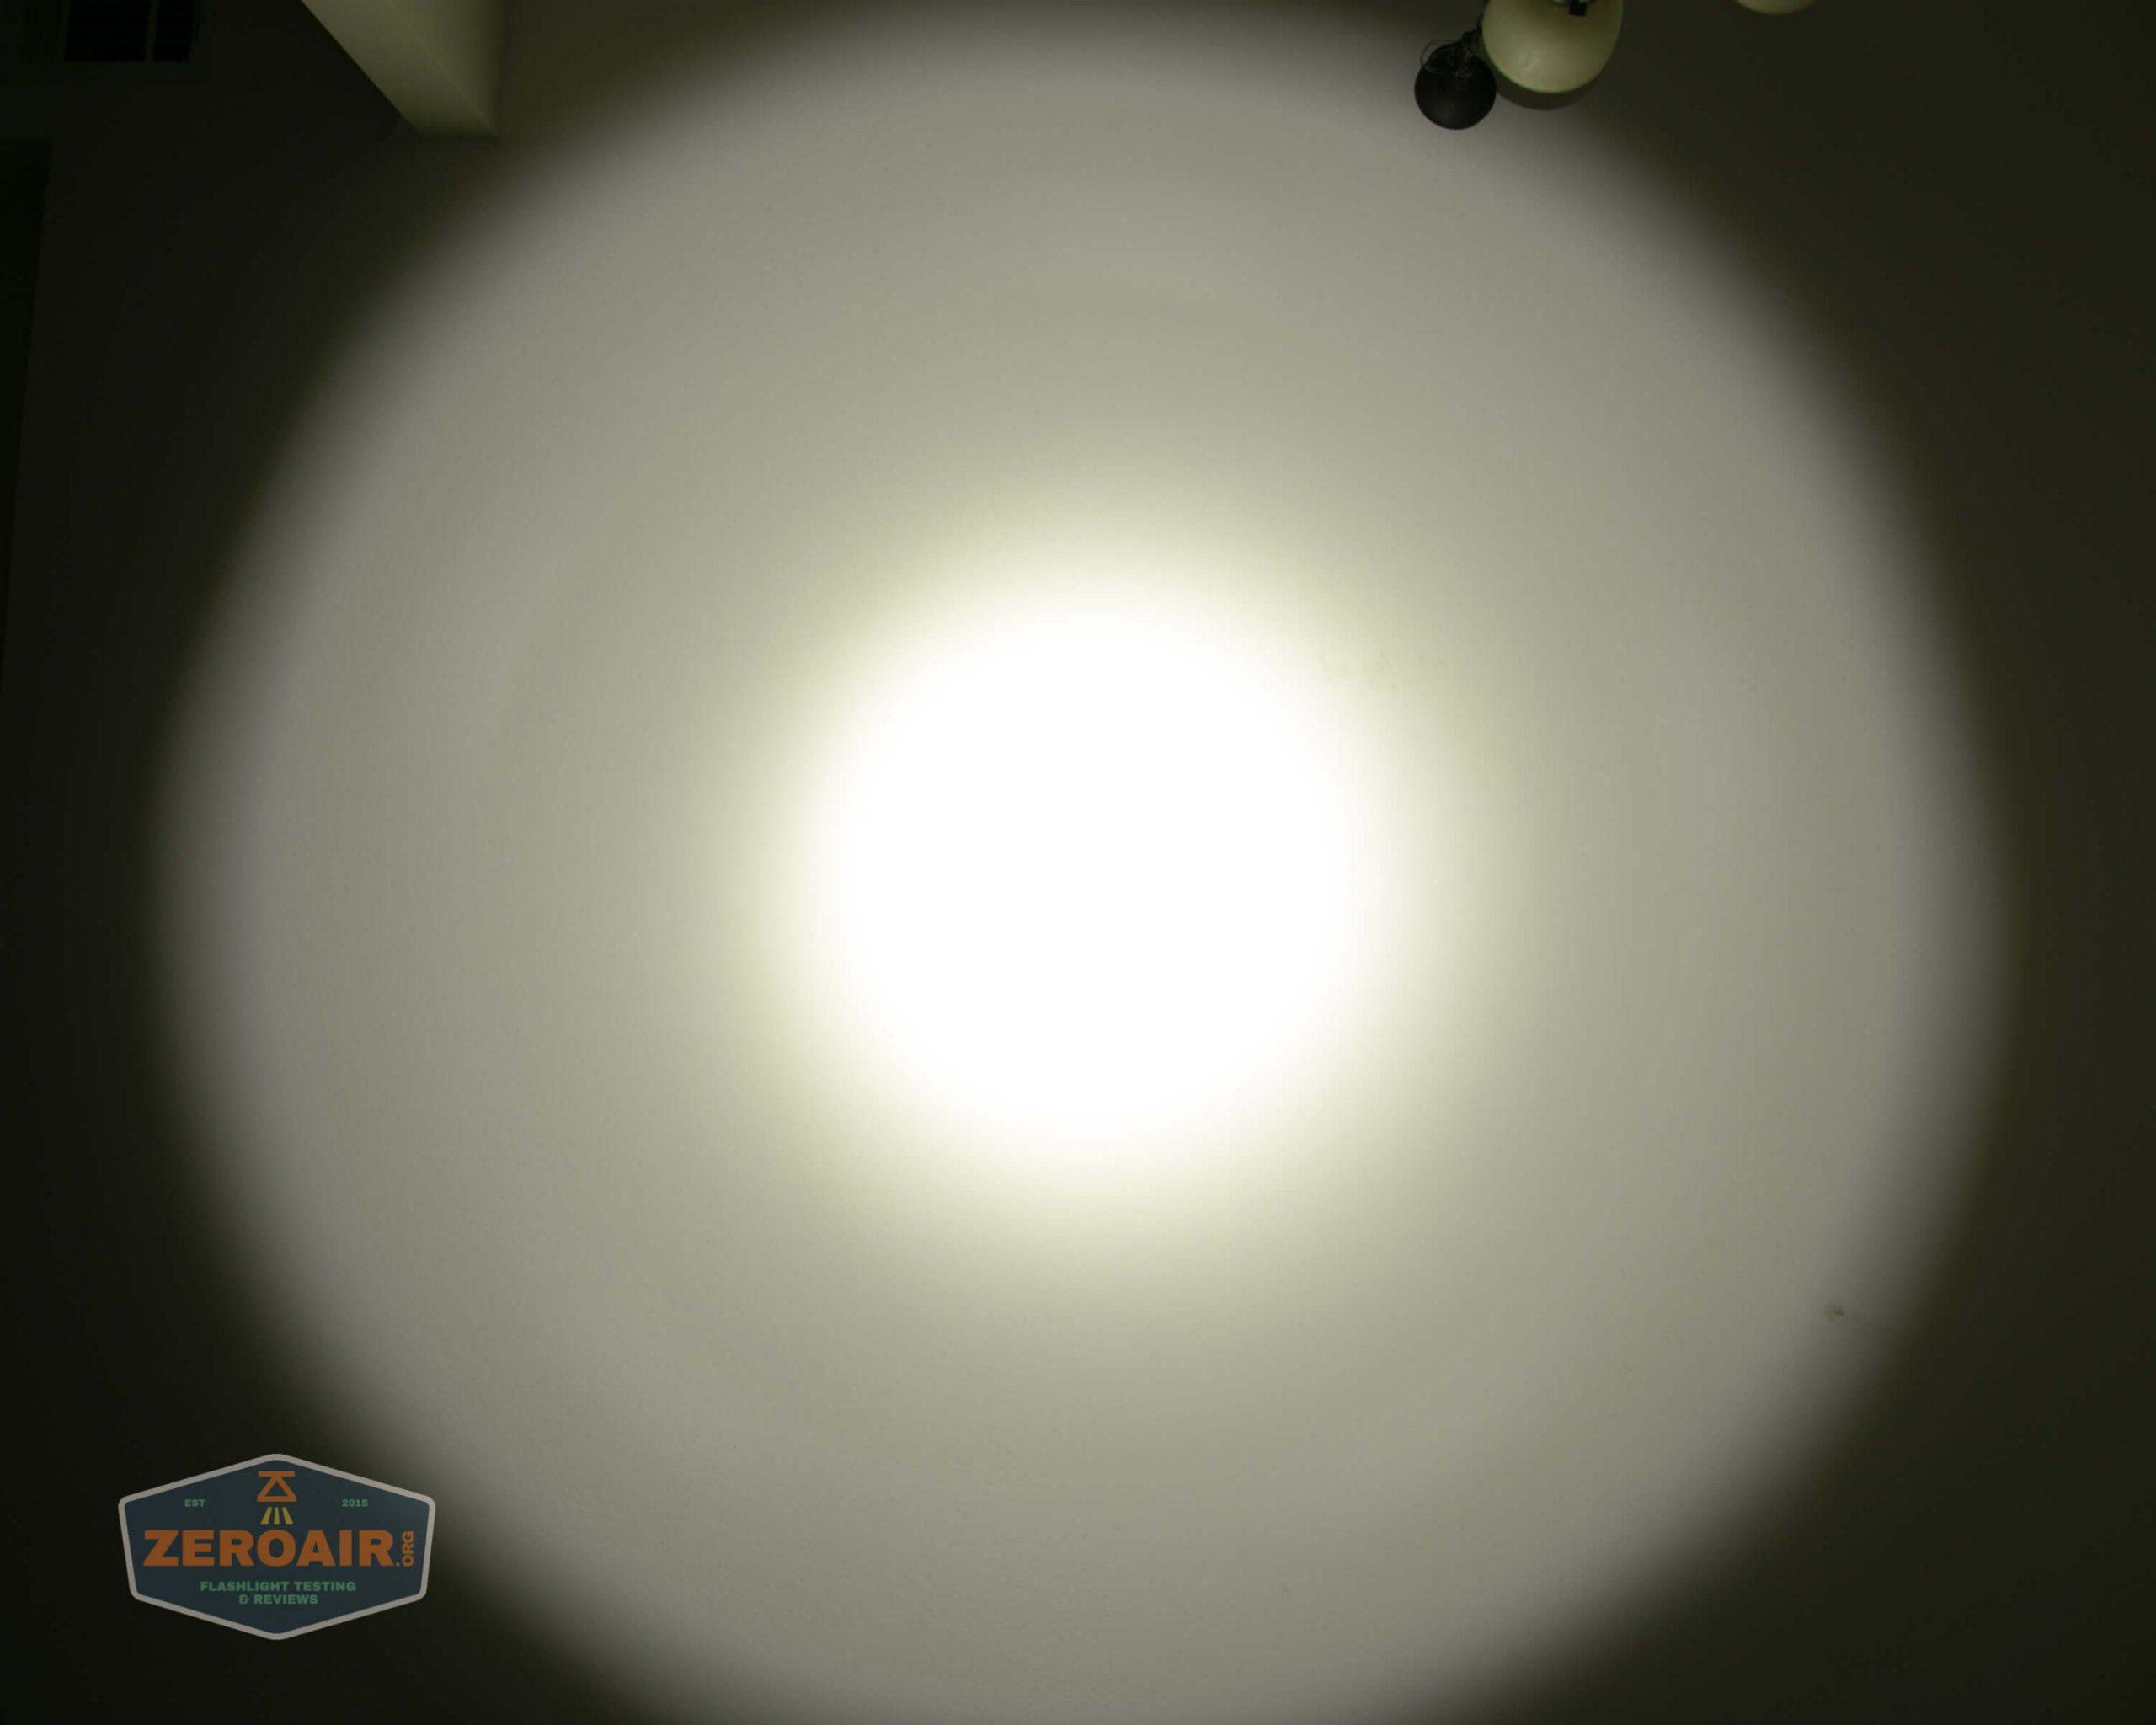 olight warrior x pro 21700 cree xhp35 hi beamshot ceiling turbo